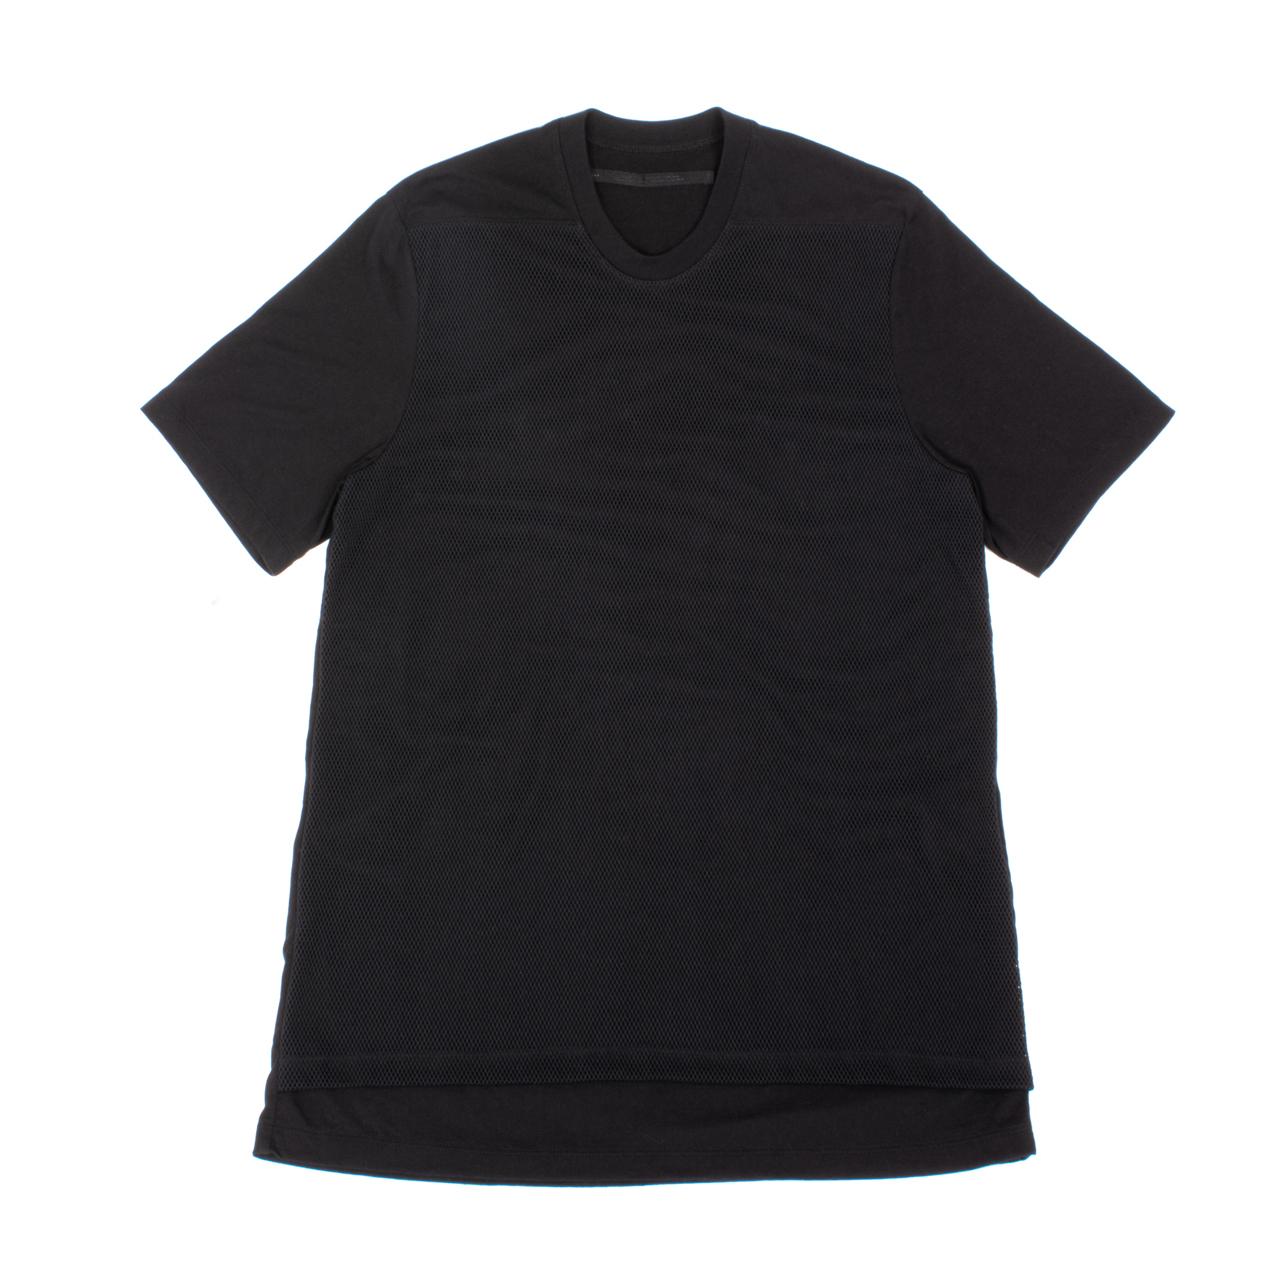 707CUM8-BLACK / フロントメッシュレイヤードTシャツ